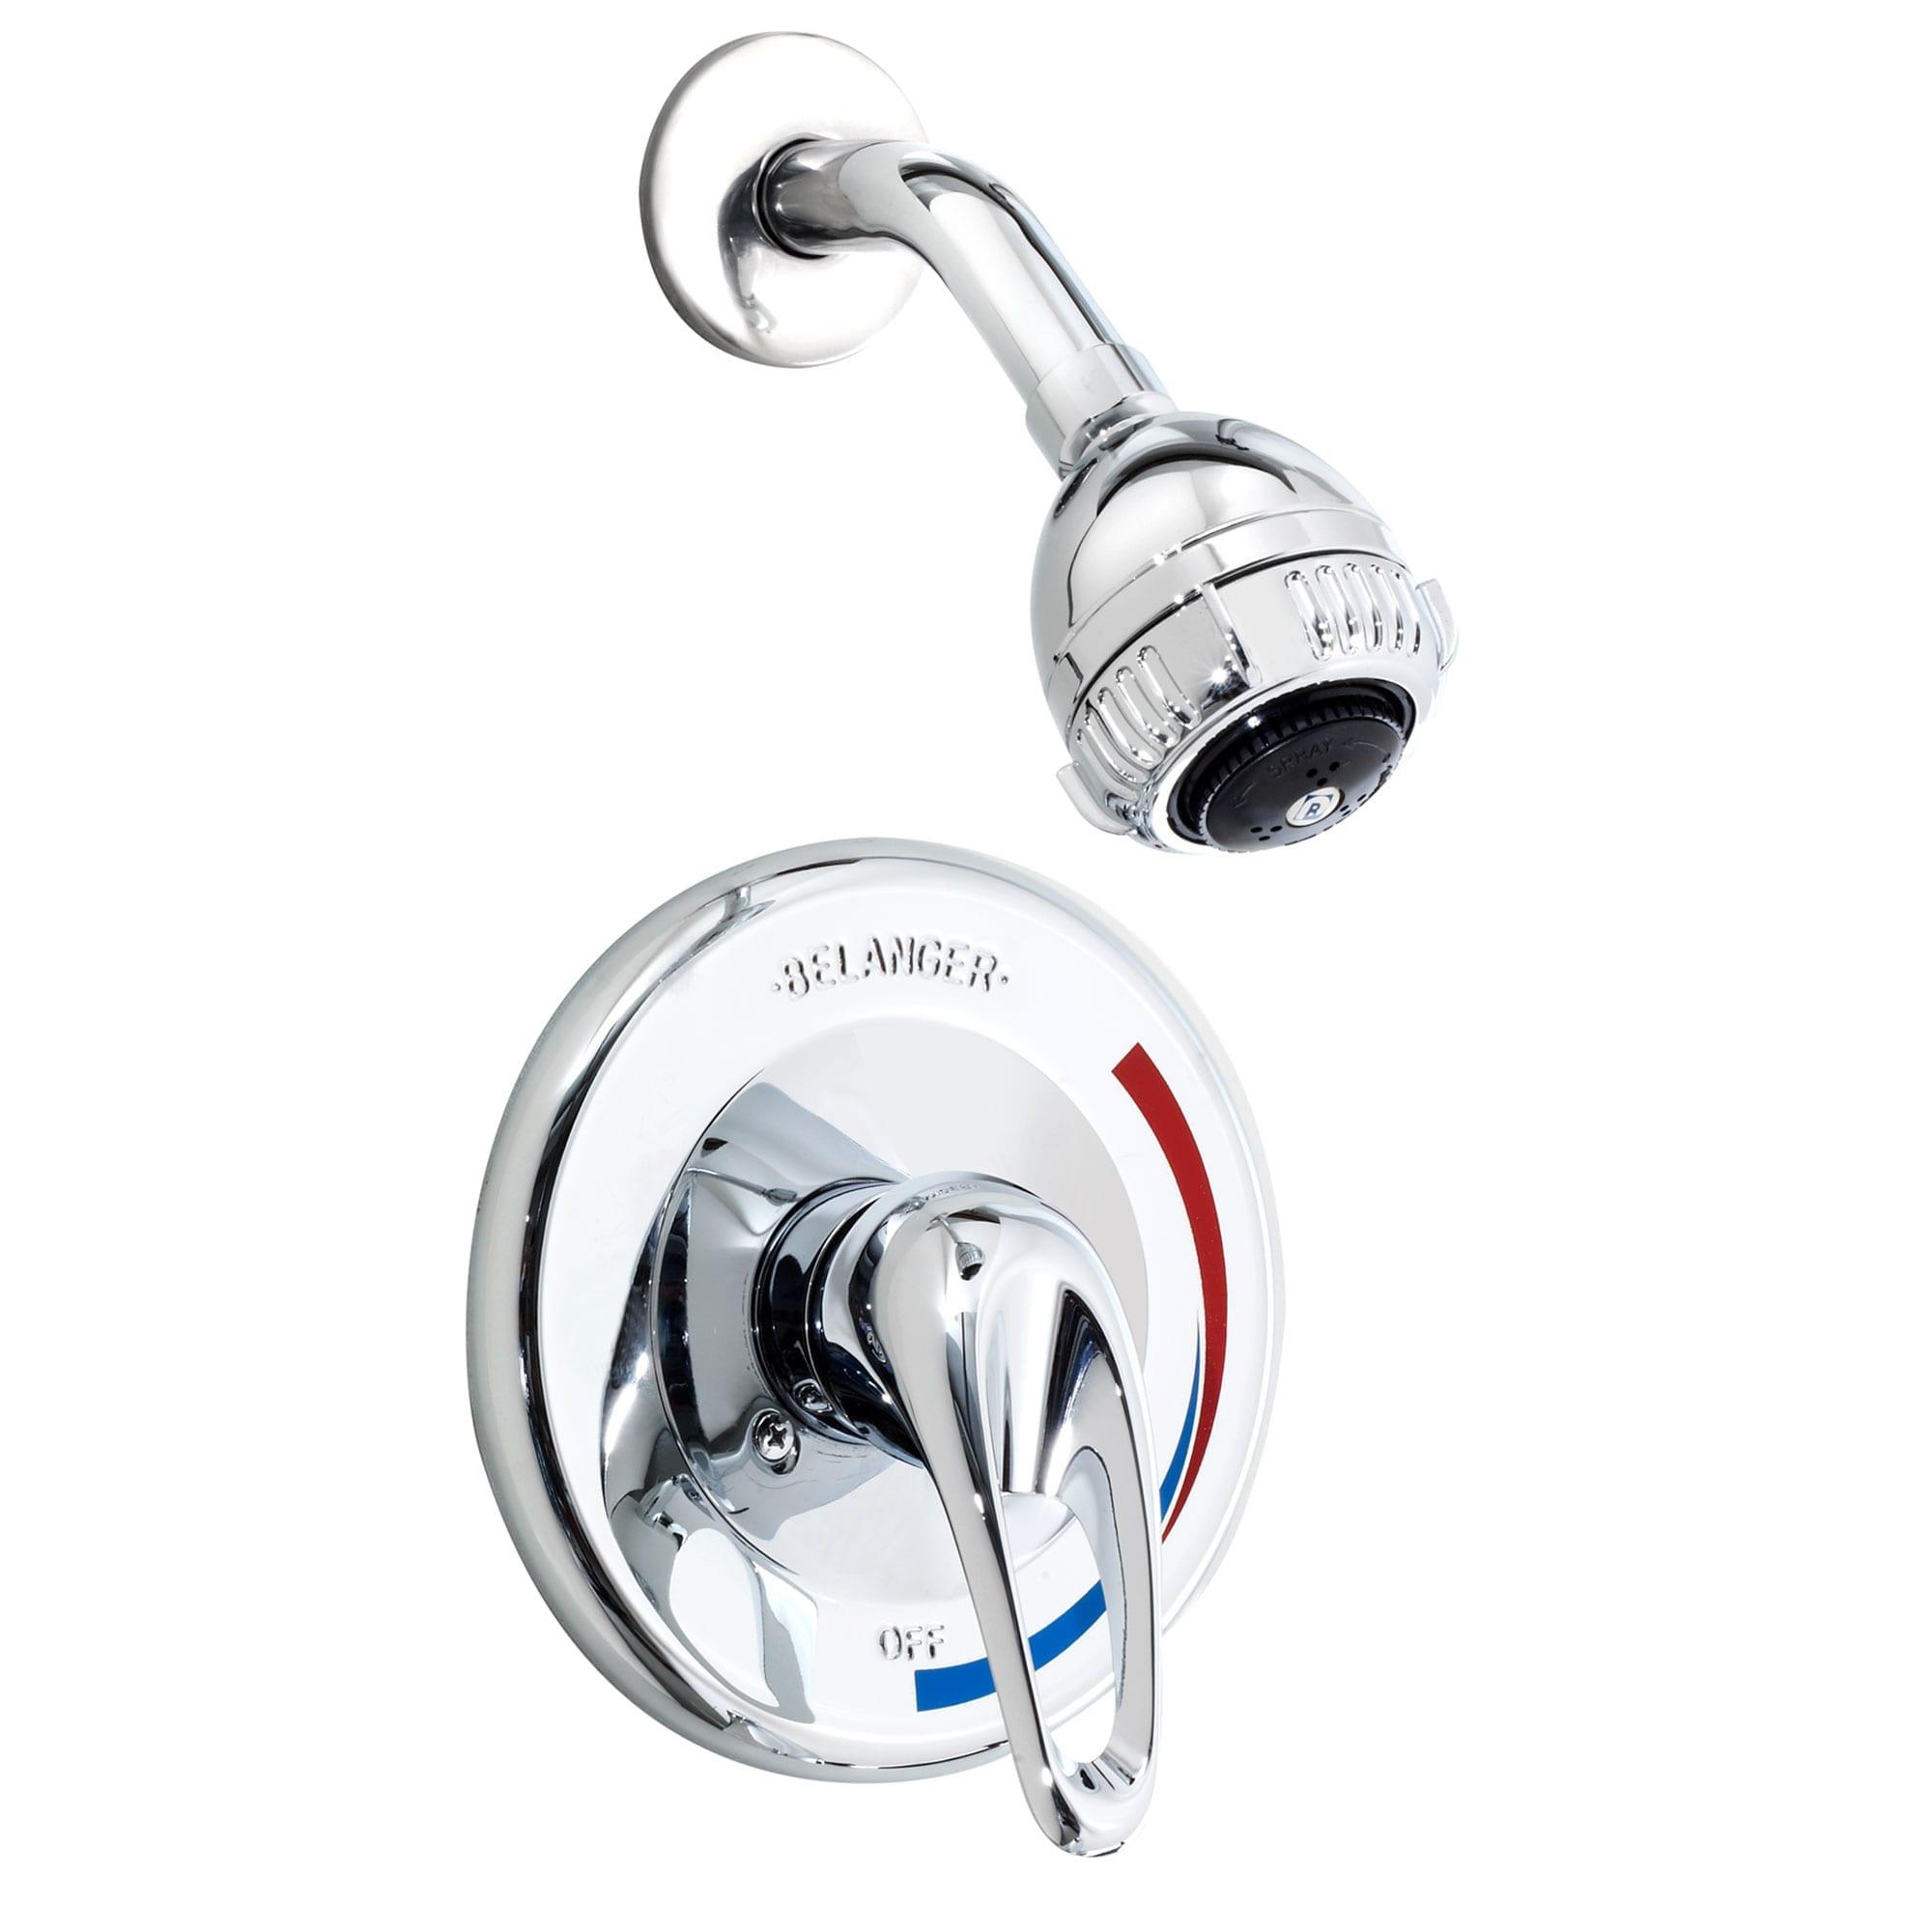 robinet pour douche mod le complet avec valve pression quilibr e b langer upt. Black Bedroom Furniture Sets. Home Design Ideas